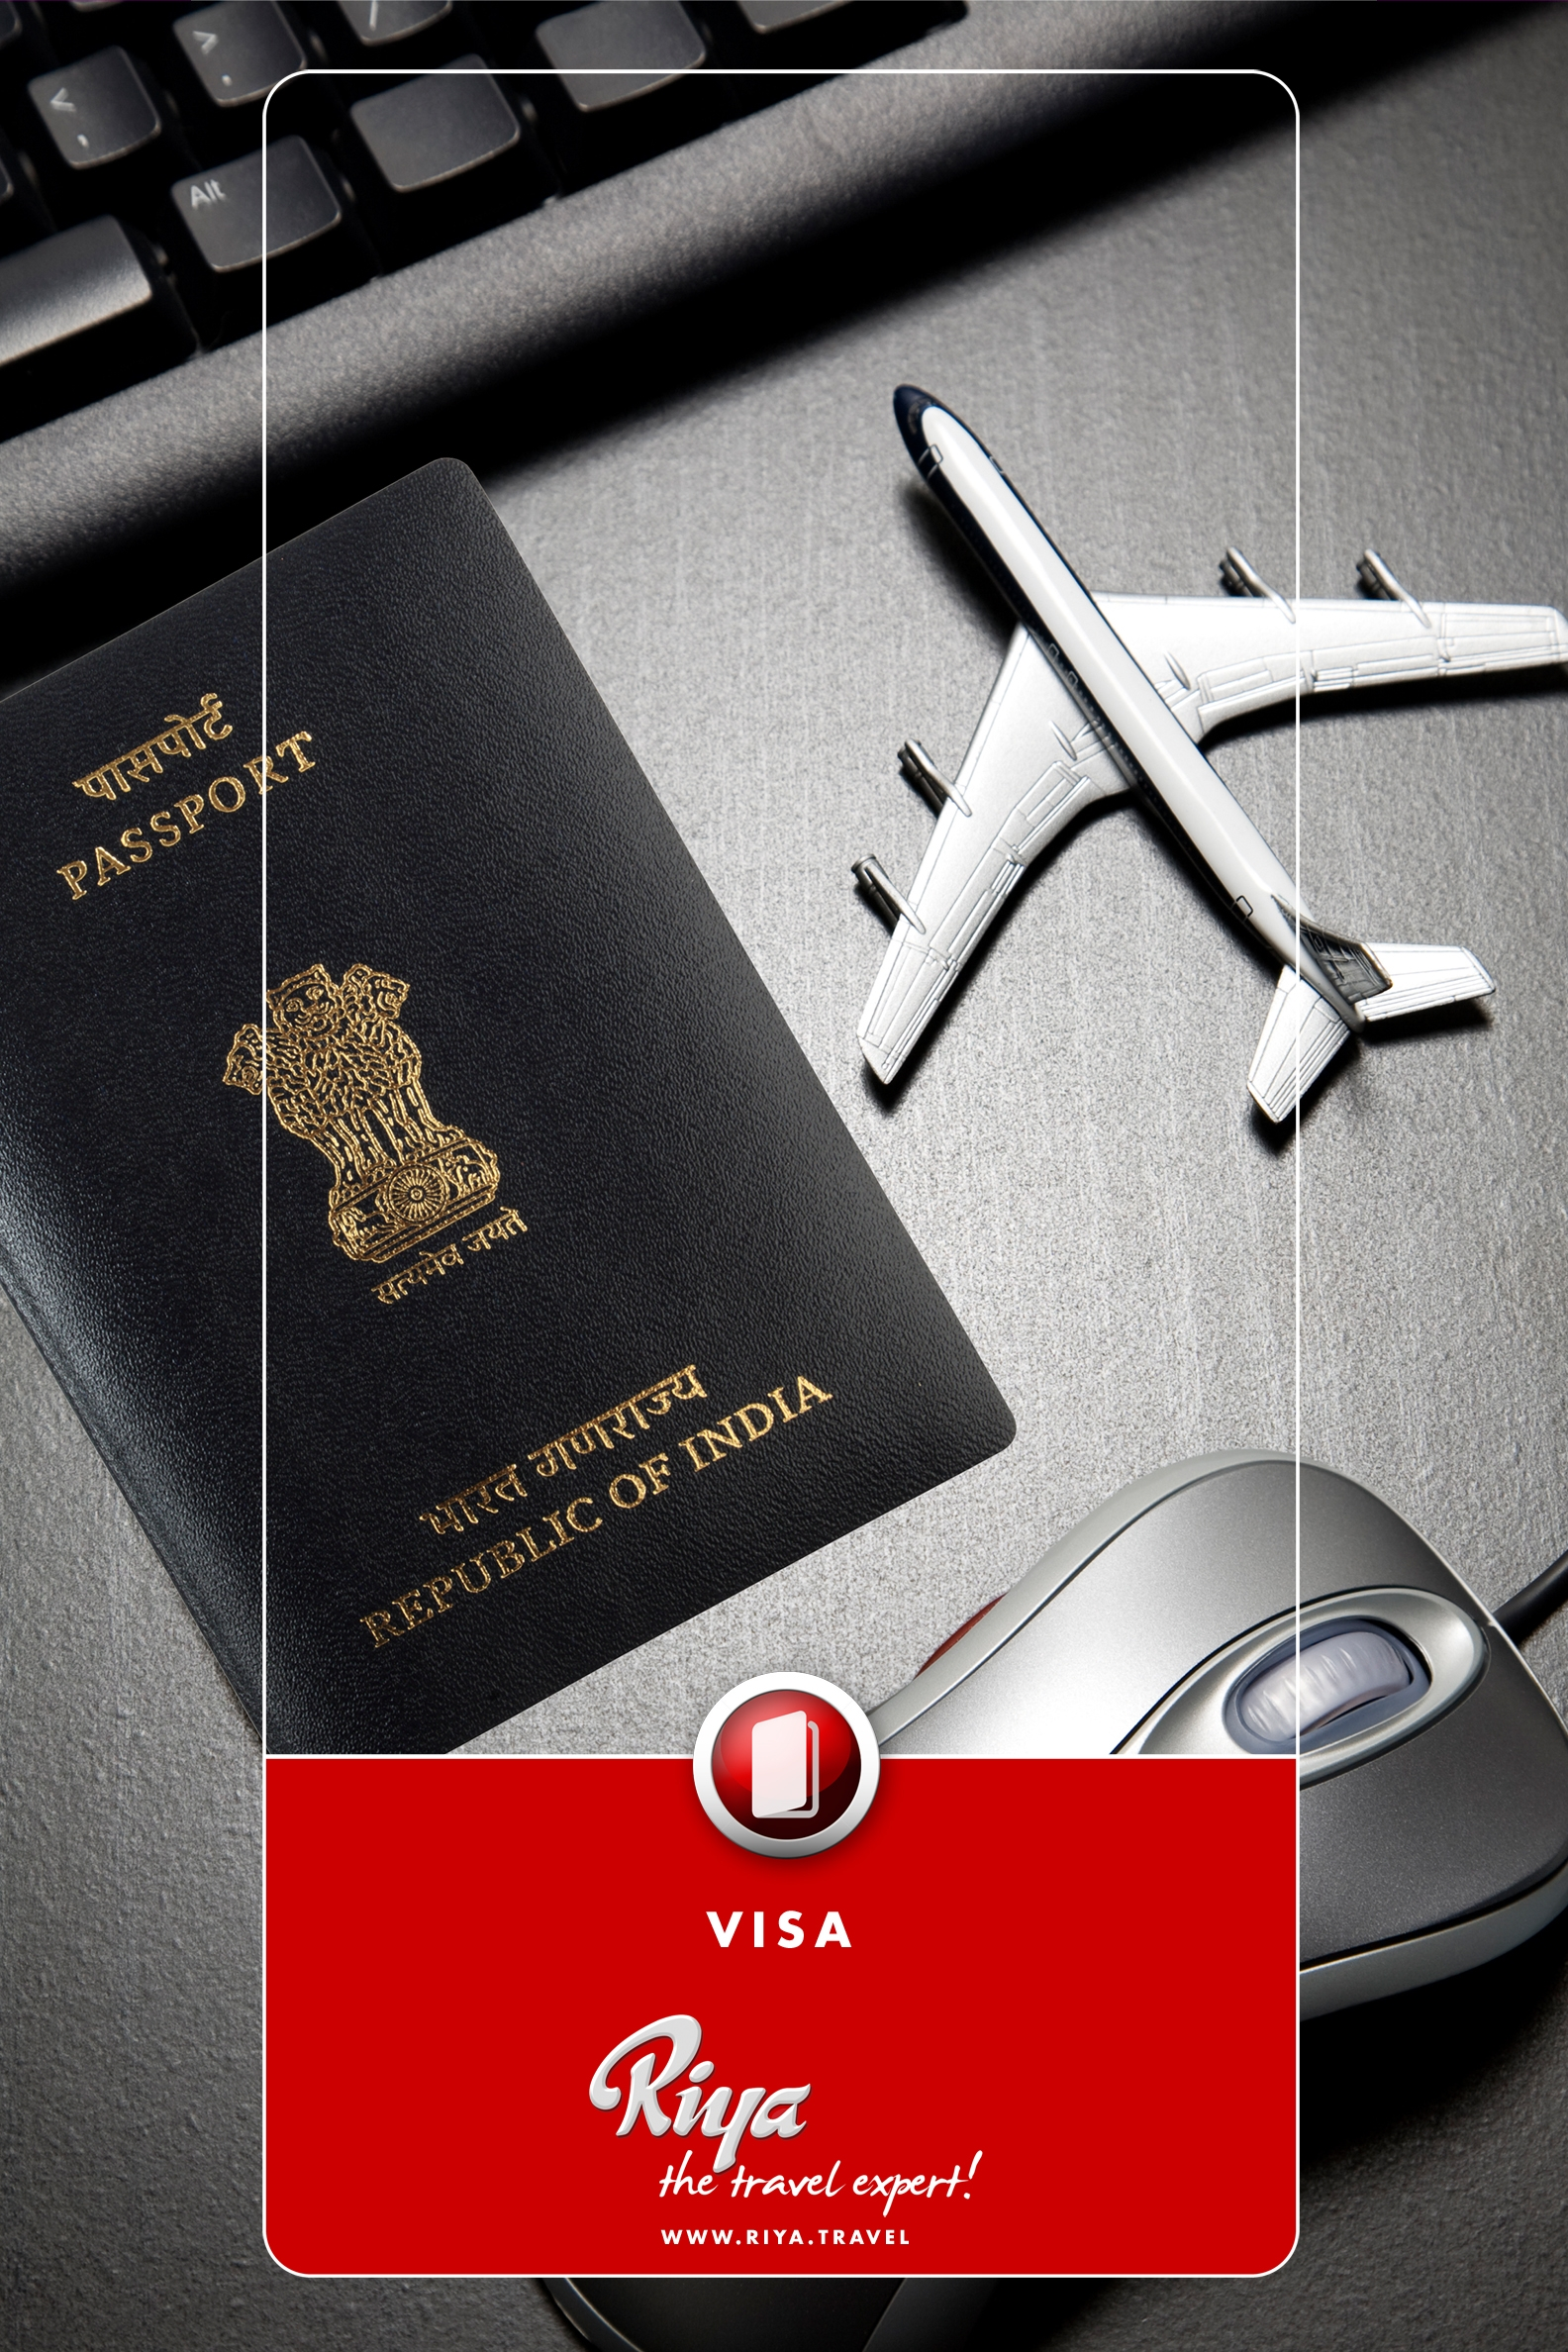 Riya Travel India Pvt Ltd